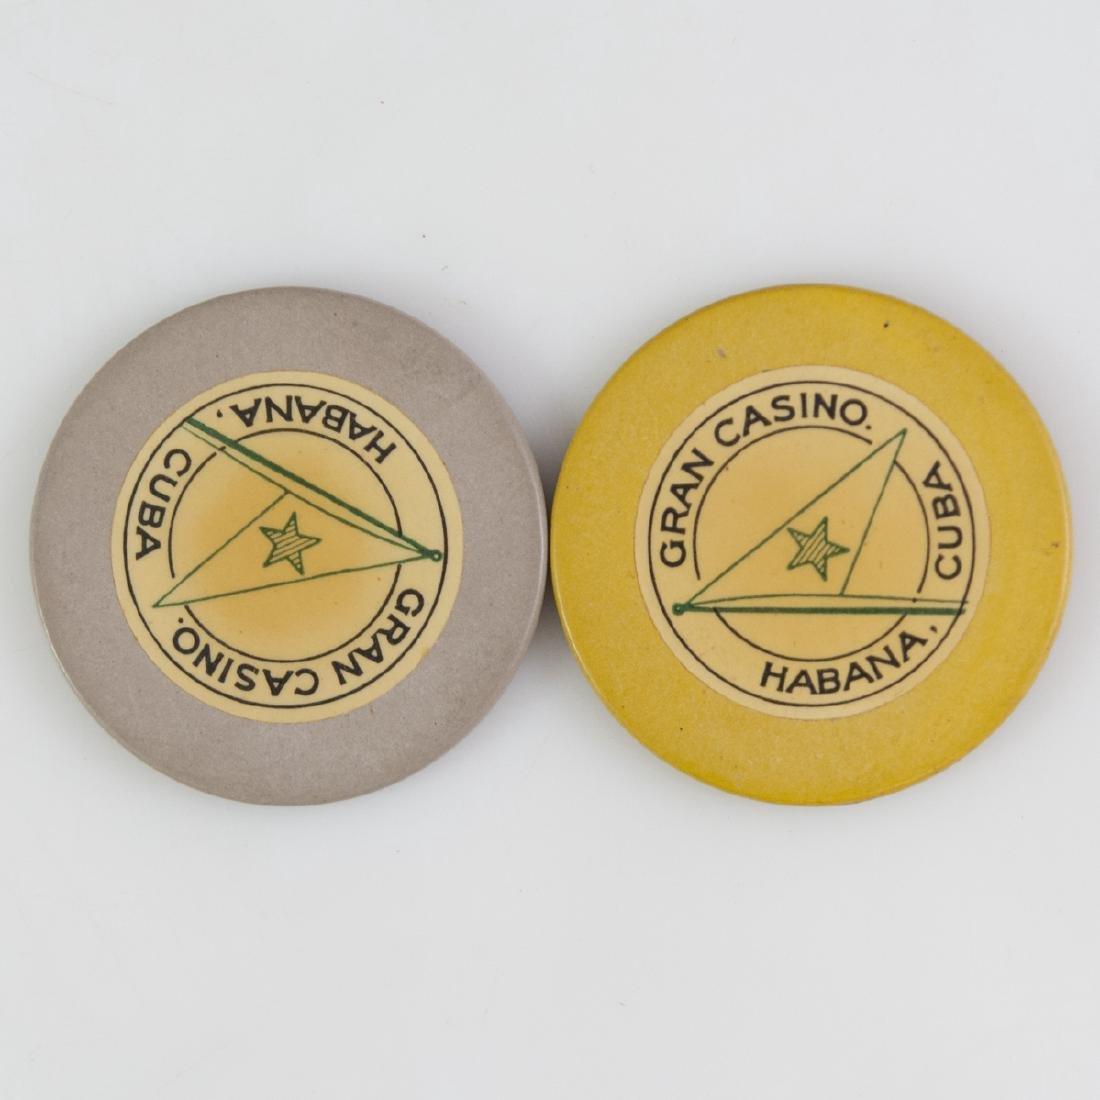 Gran Casino Habana Cuba Chips - 2